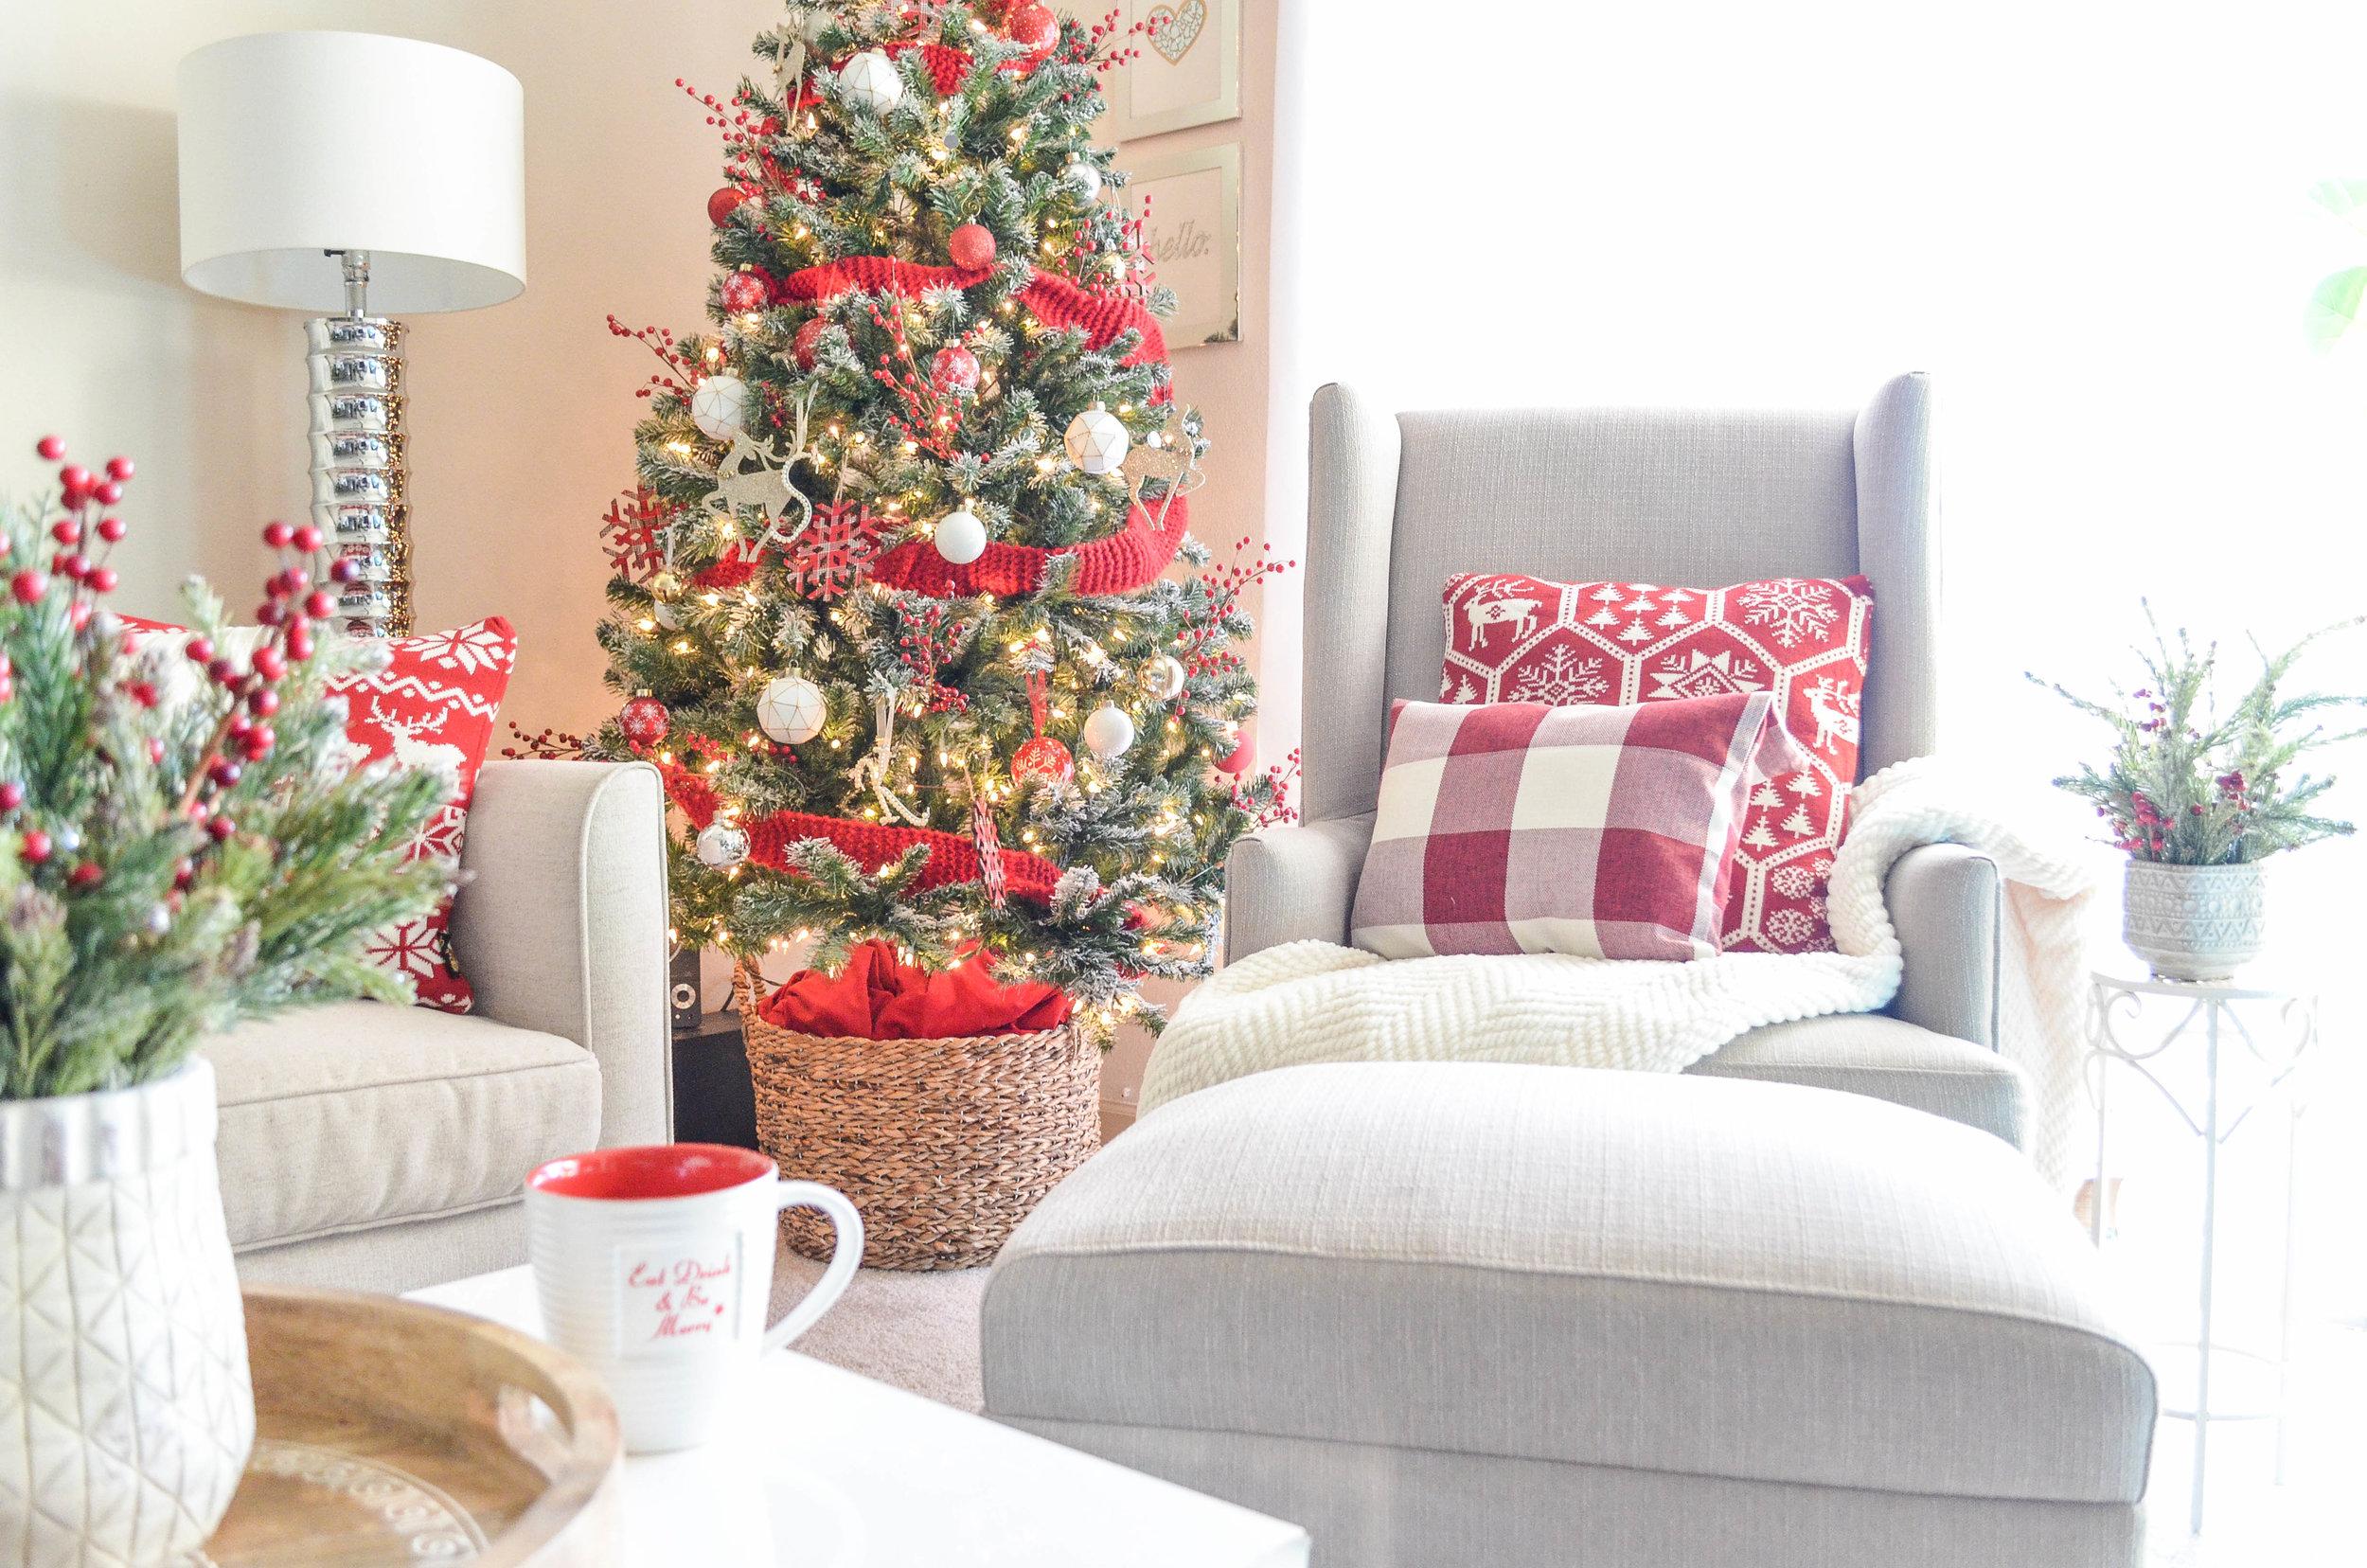 Cozy Christmas Decor-1.jpg